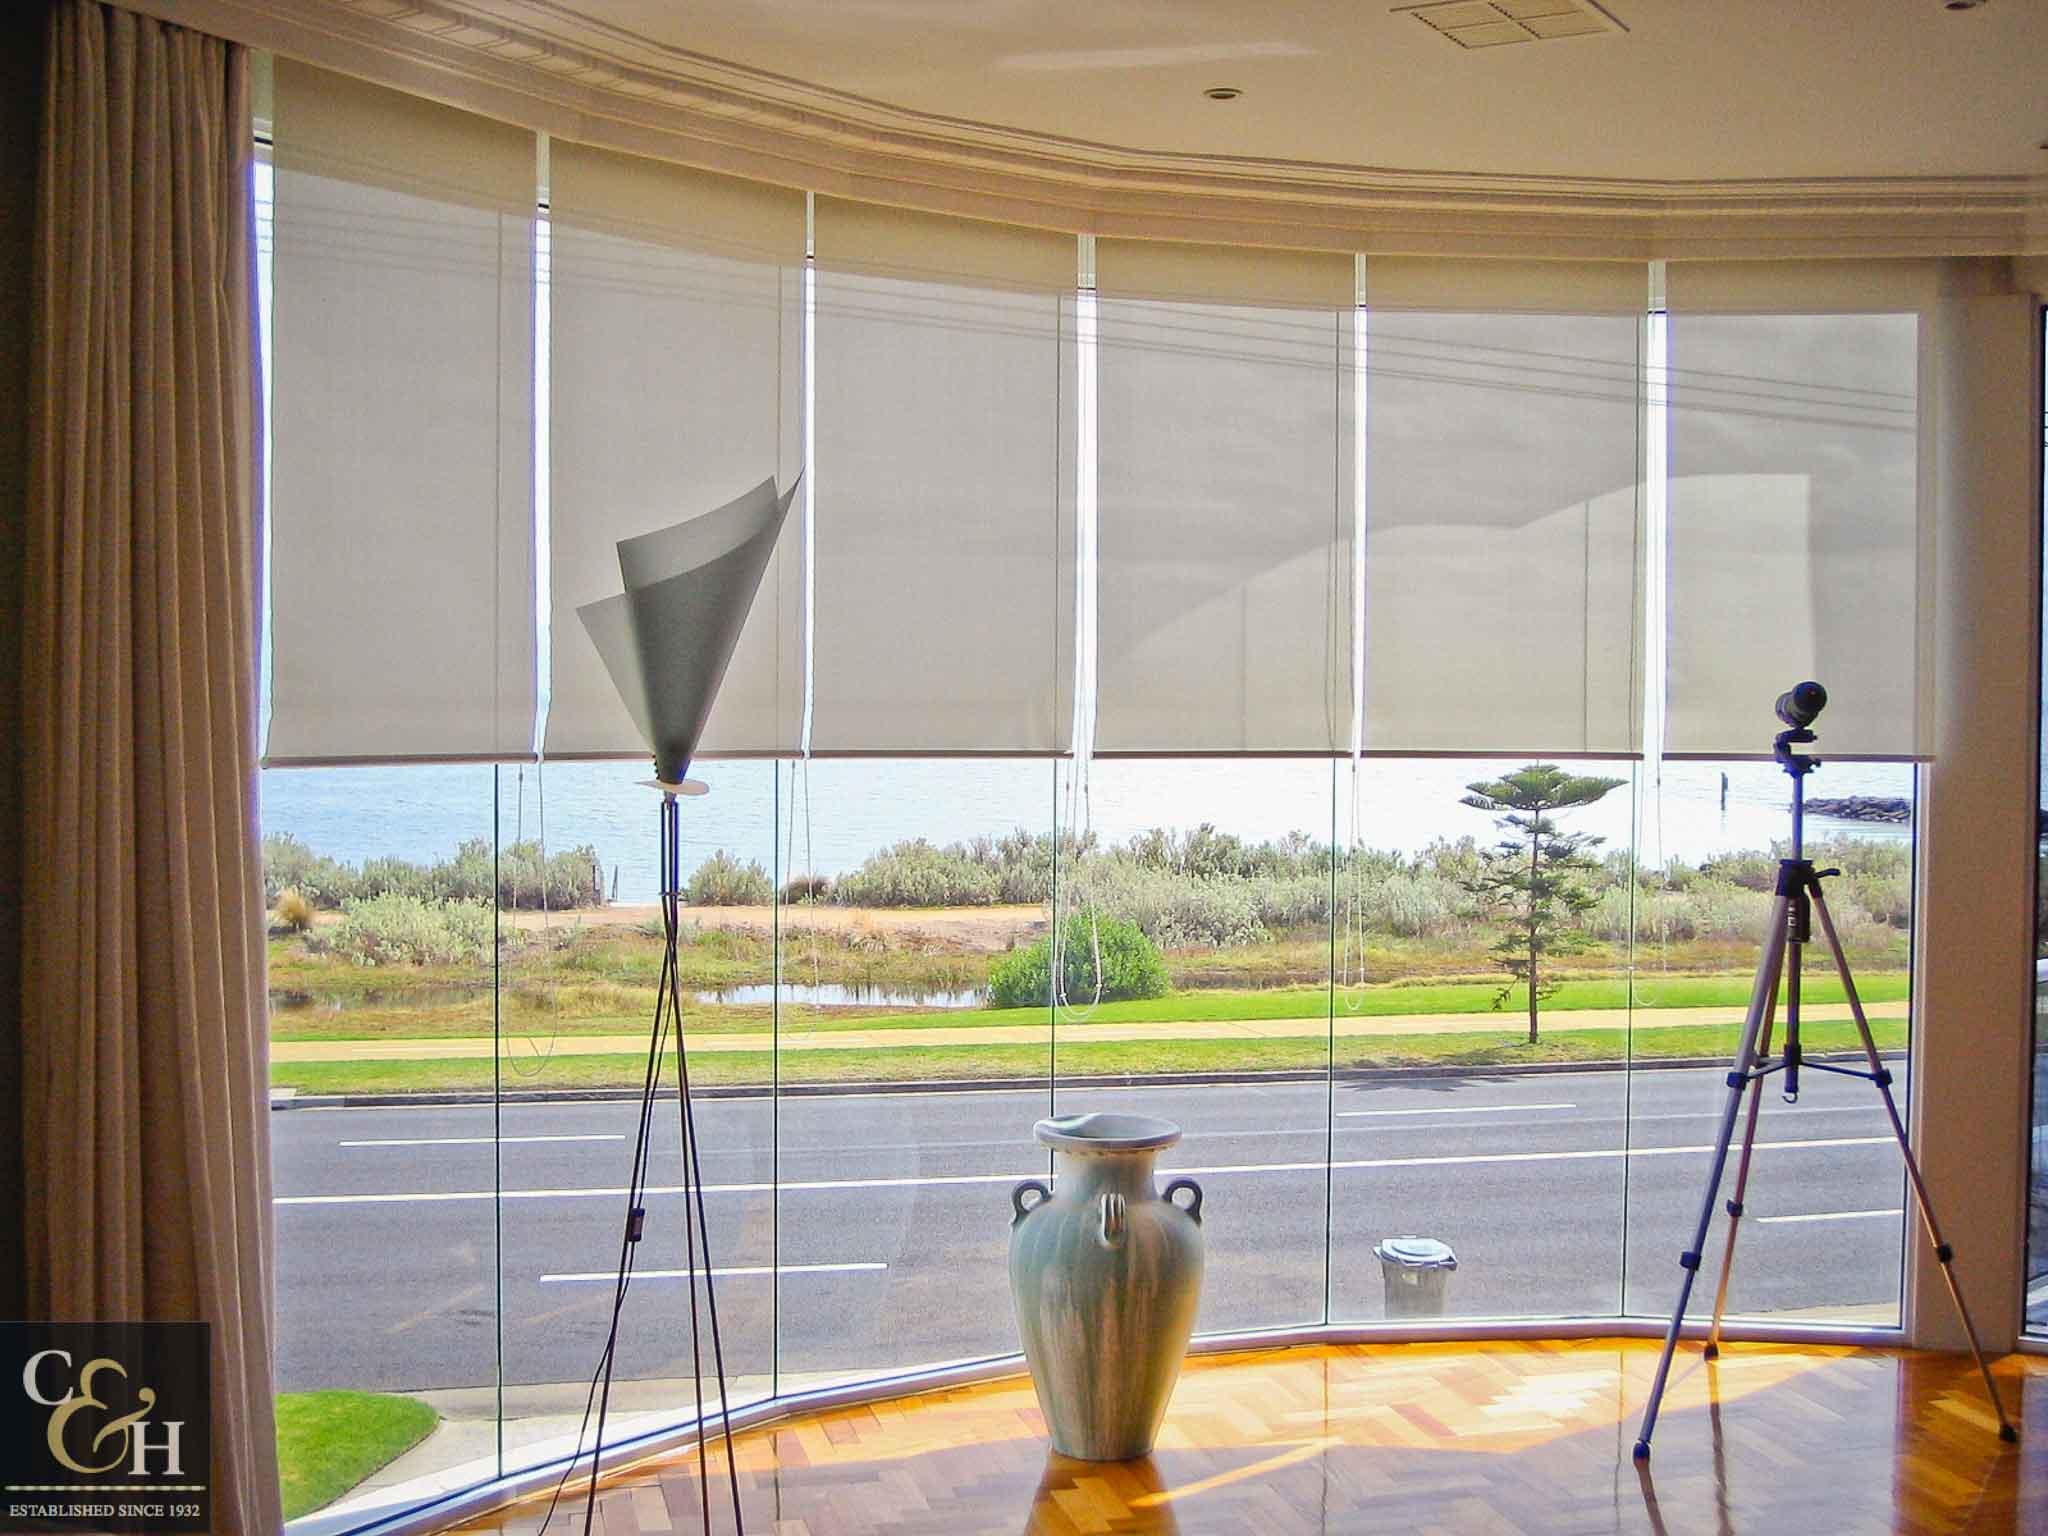 Screen-Roller-Blinds-23 inside a living room